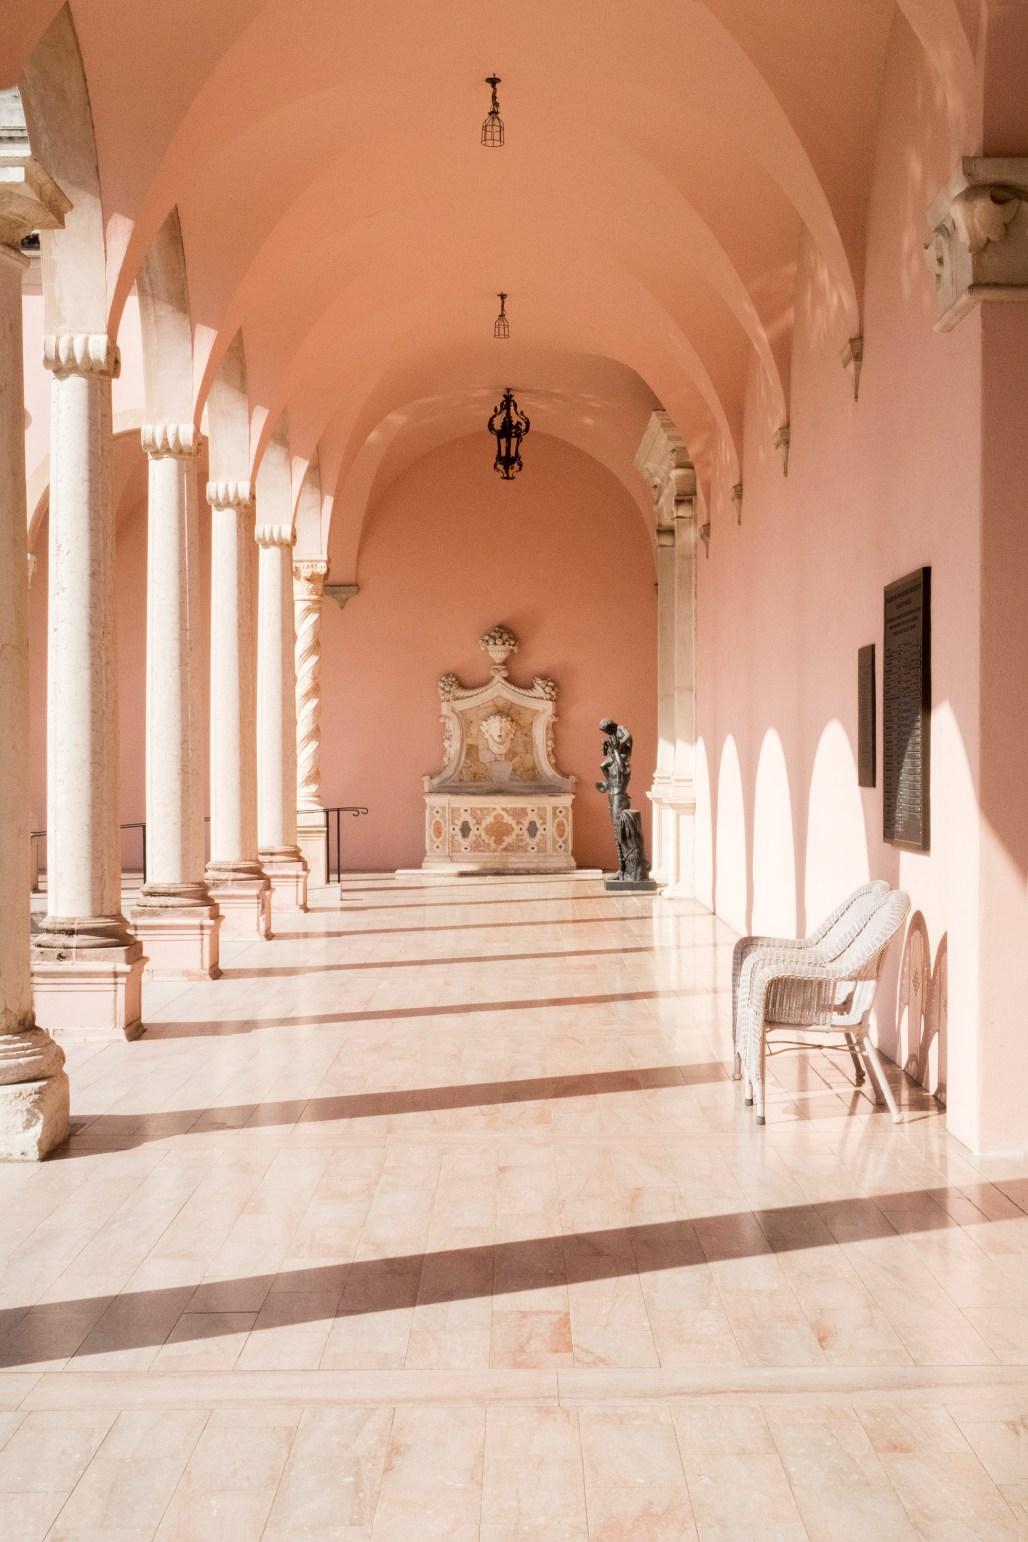 ringling-art-museum-fountain